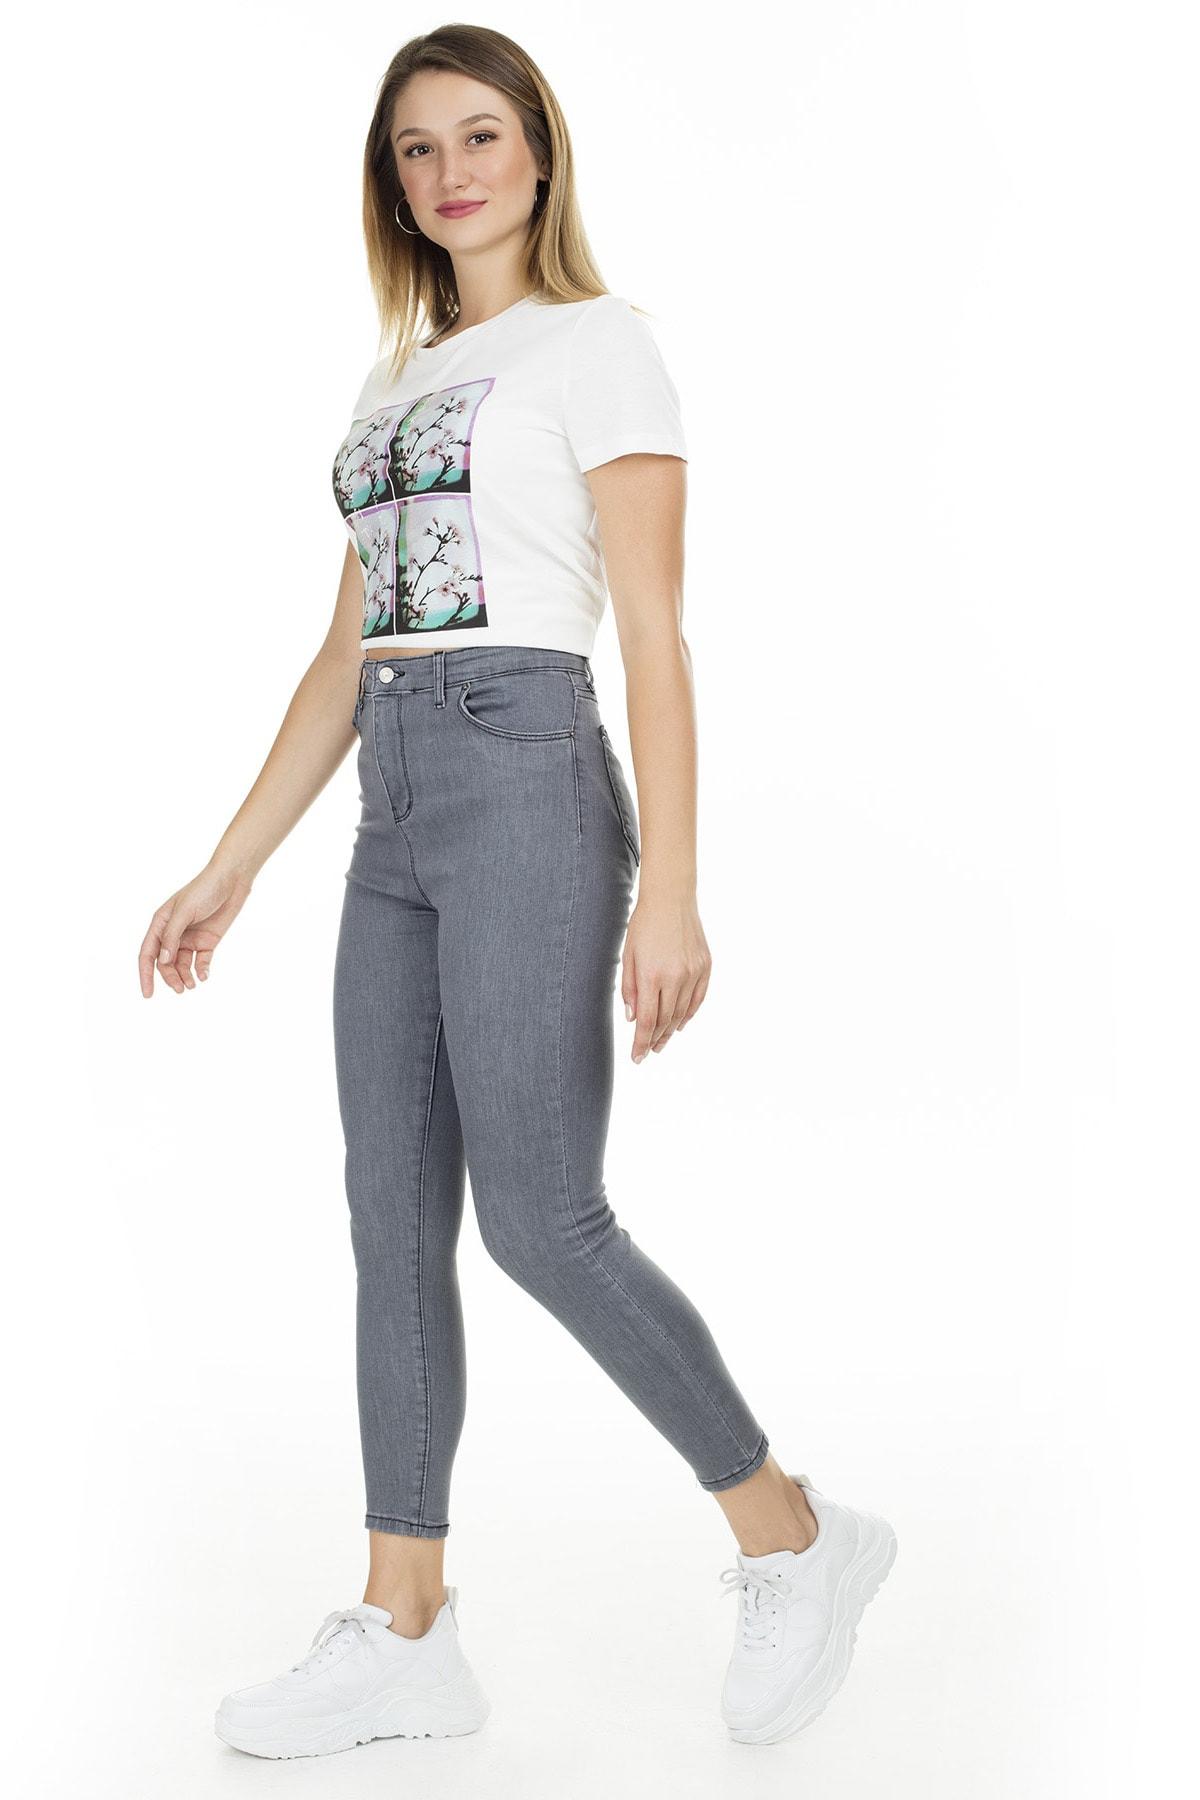 Lela Kadın Yüksek Bel Skinny Jeans Kot Pantolon 58714861